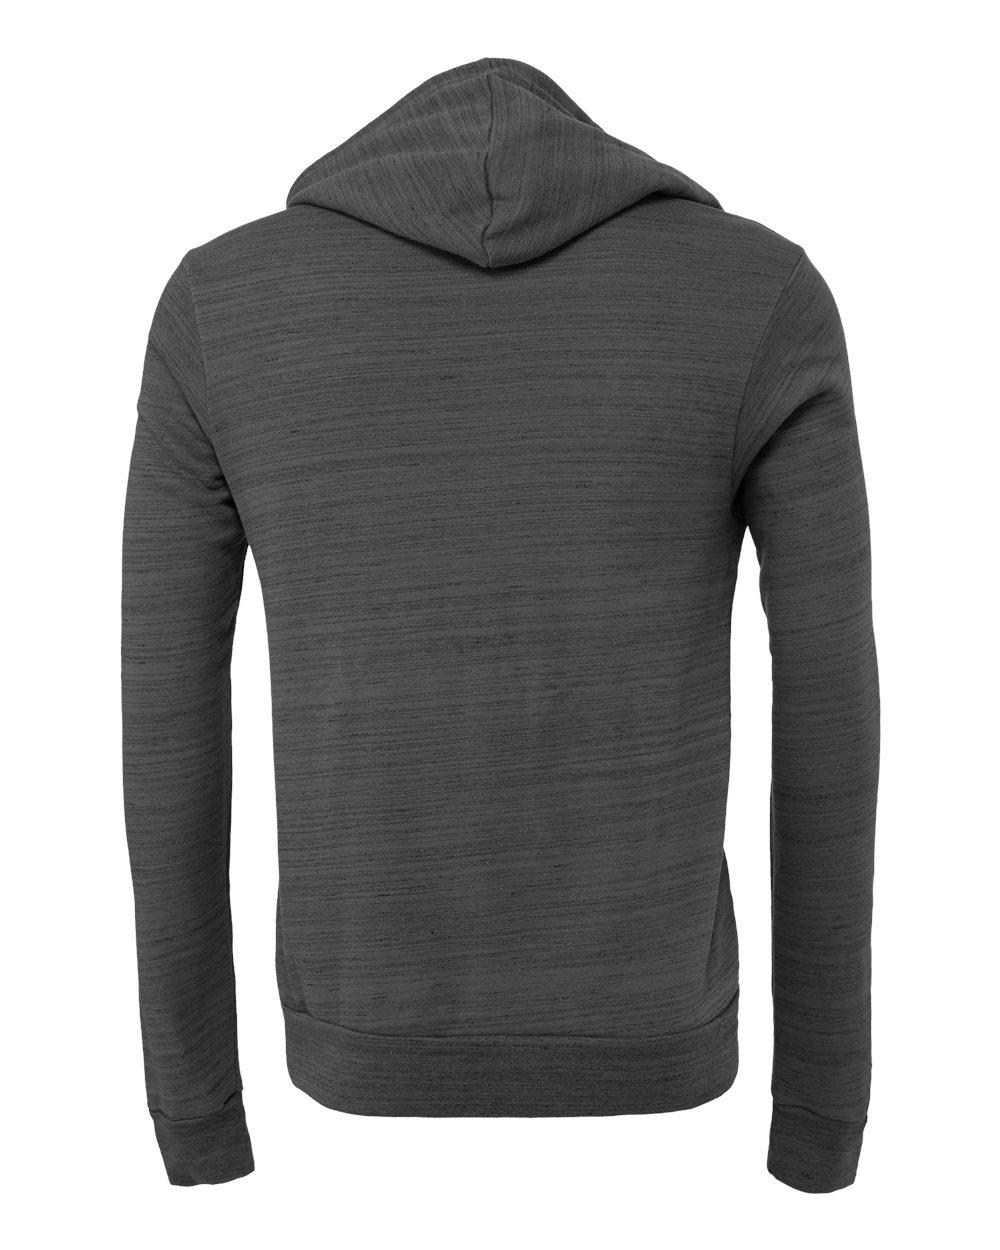 Bella-Canvas-Unisex-Sponge-Hooded-Pullover-Sweatshirt-Blank-3719-up-to-2XL thumbnail 23